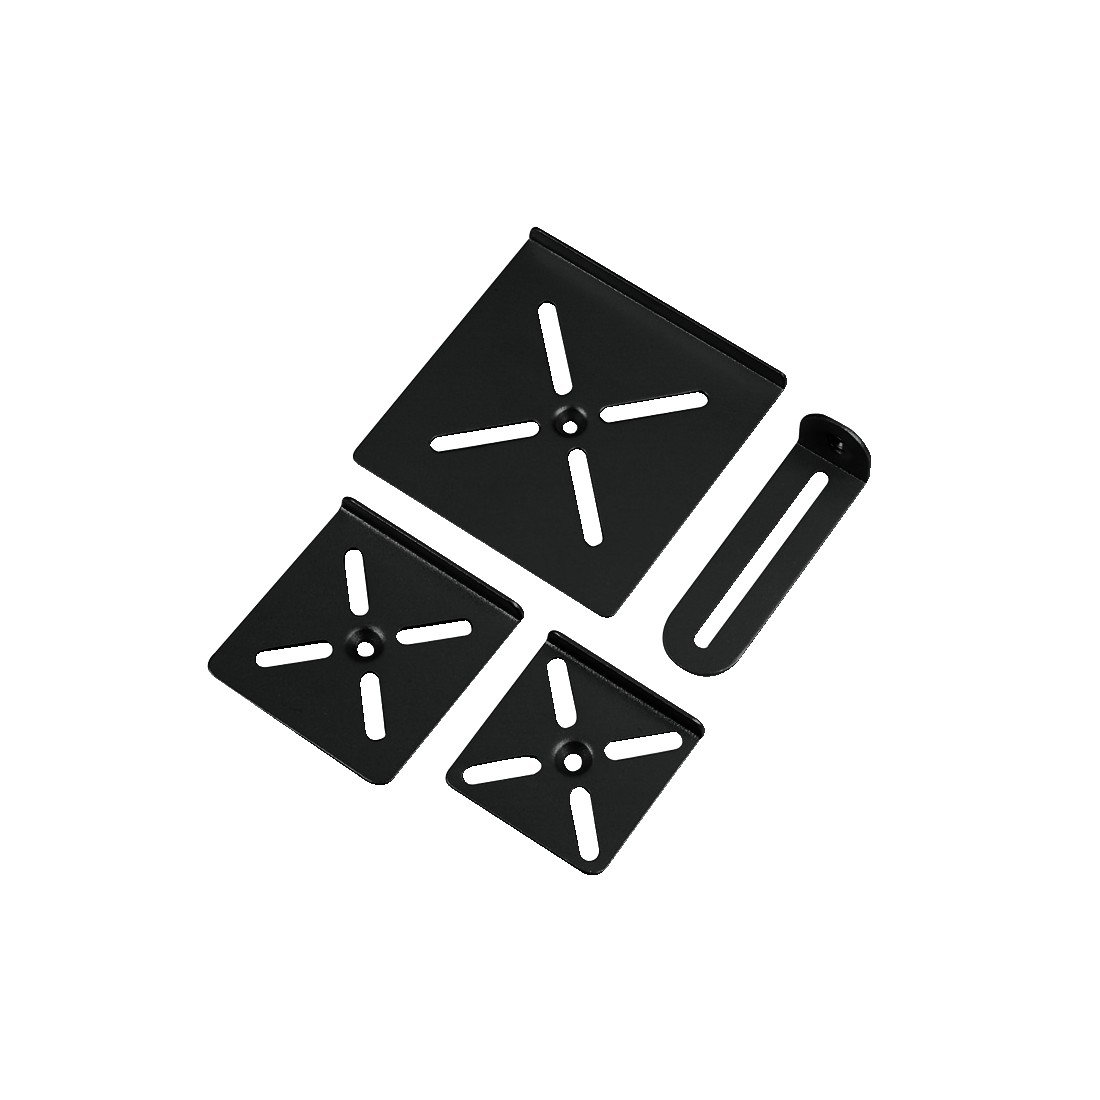 Hama Slim Supporto Universale Regolabile per Casse 123 cm 5 kg Nero